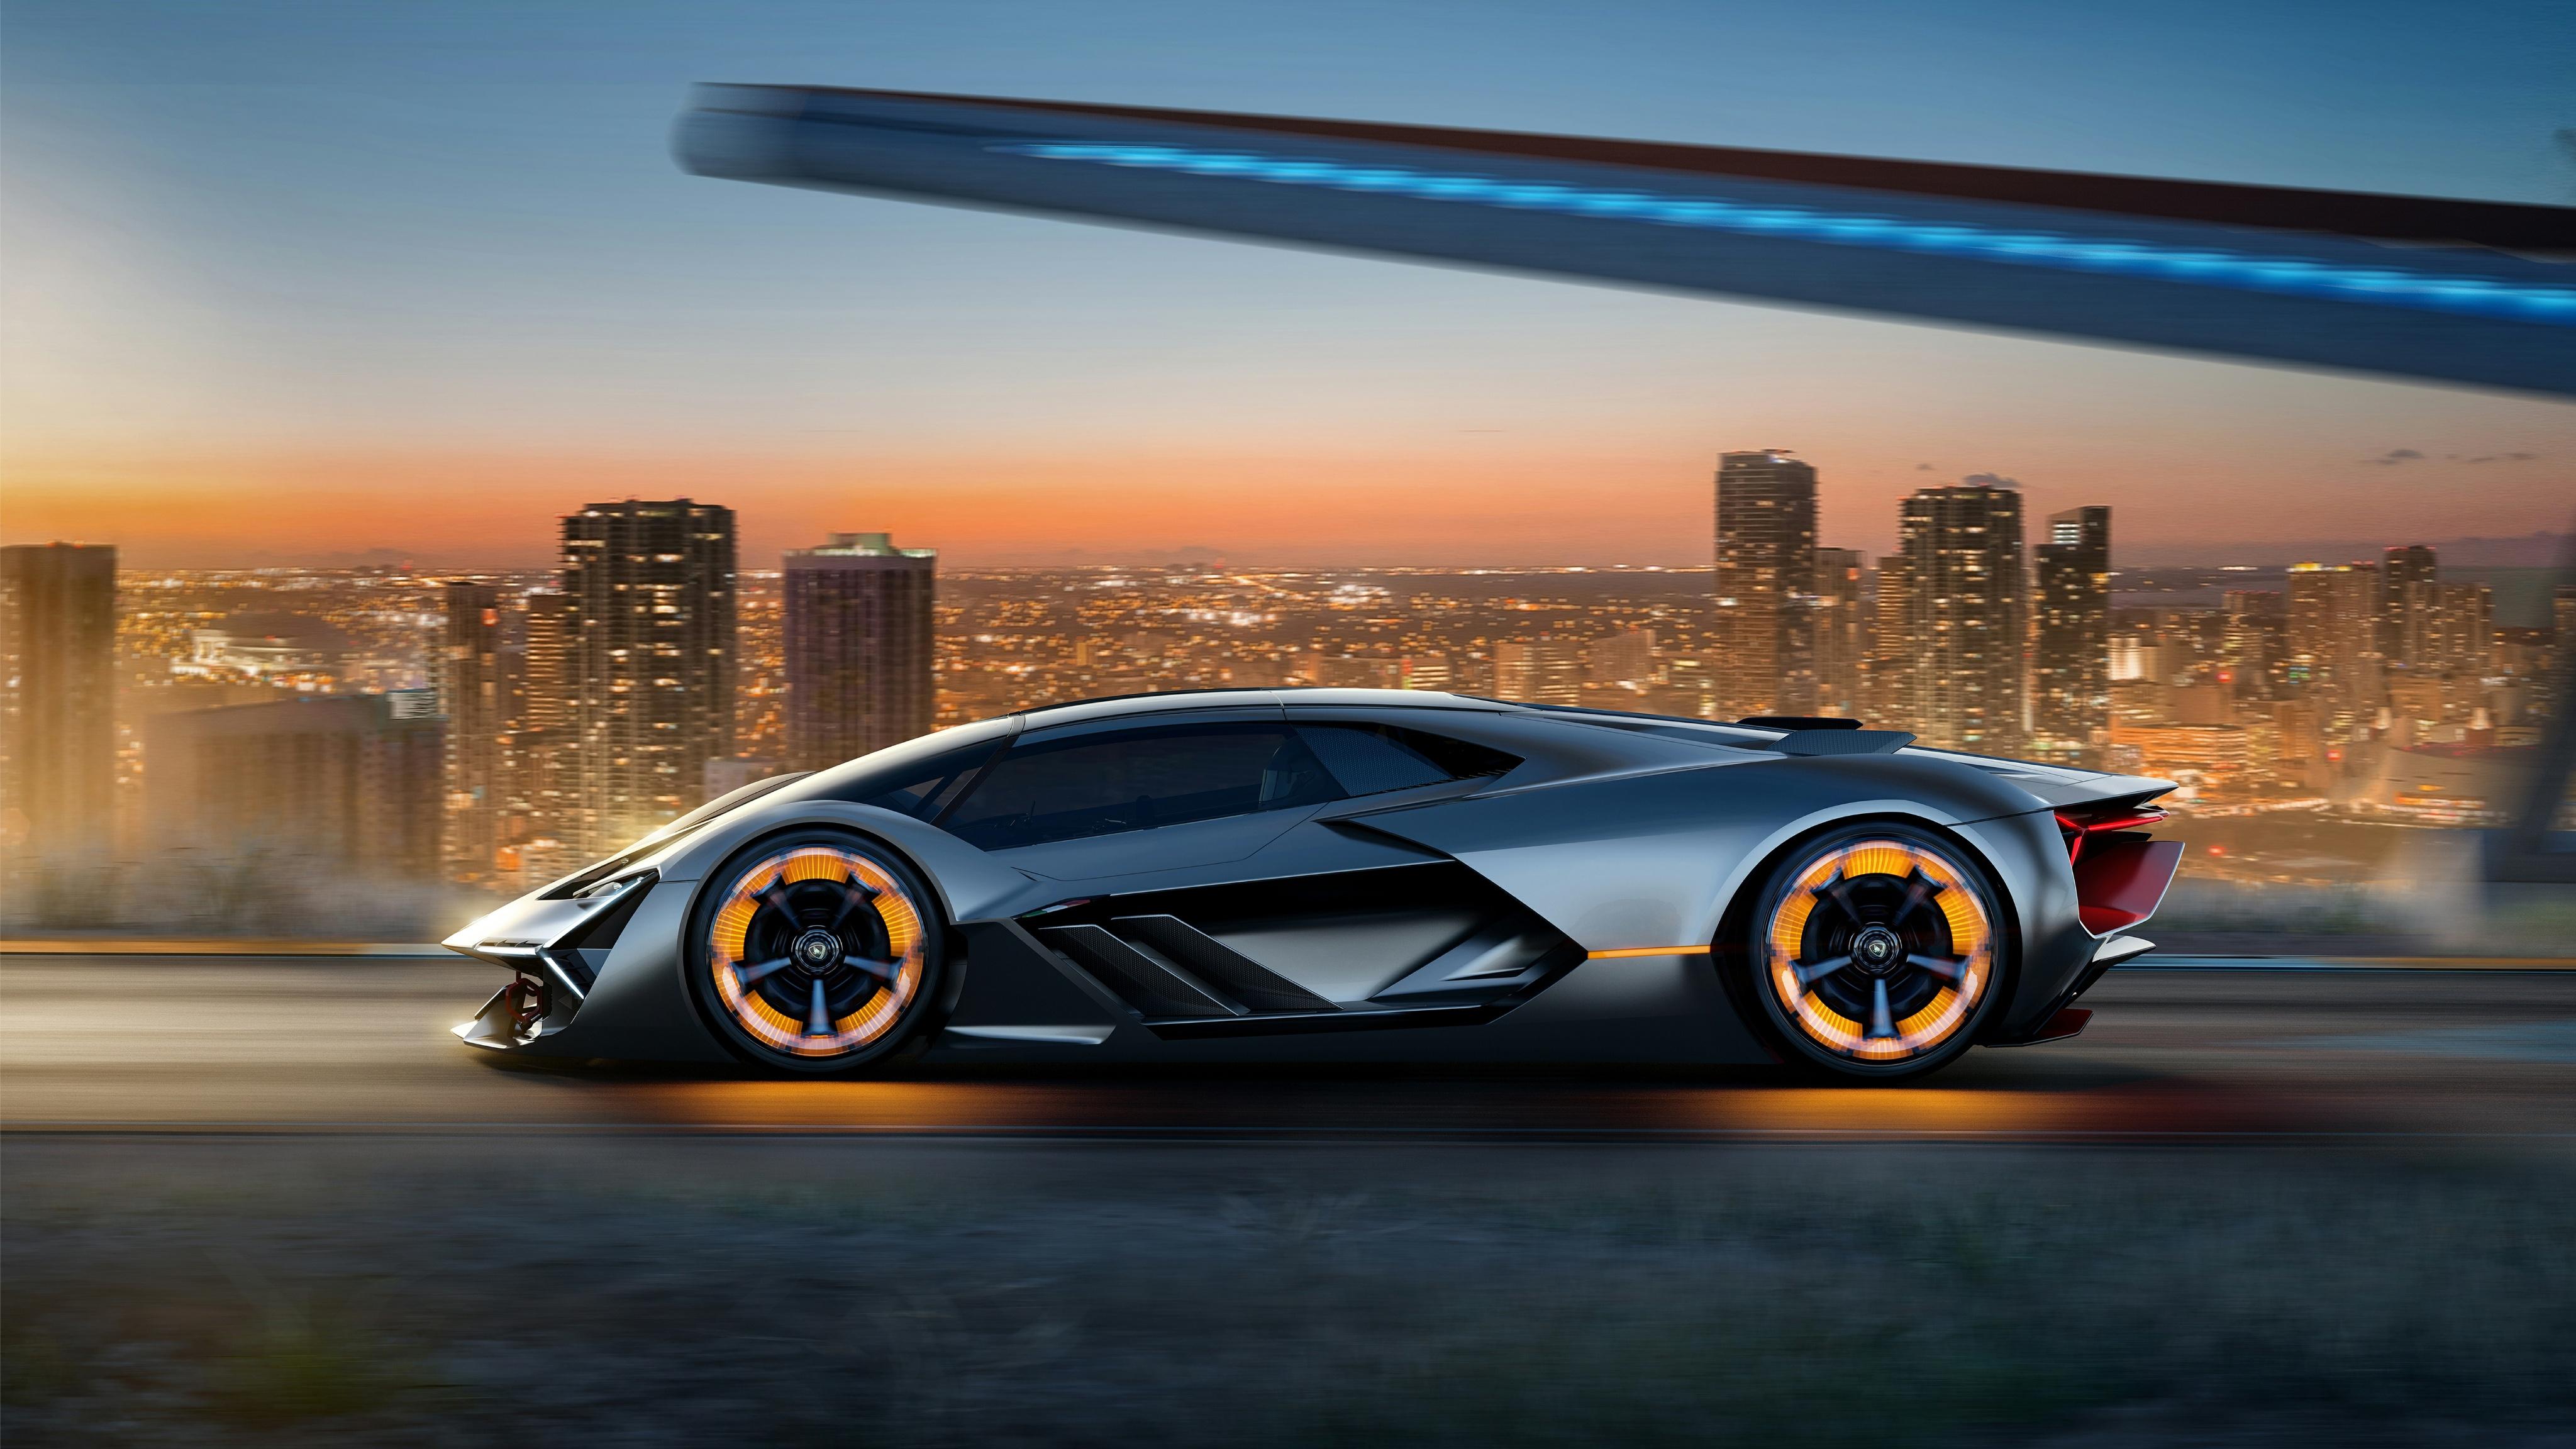 382 4K Ultra HD Lamborghini Wallpapers Background Images